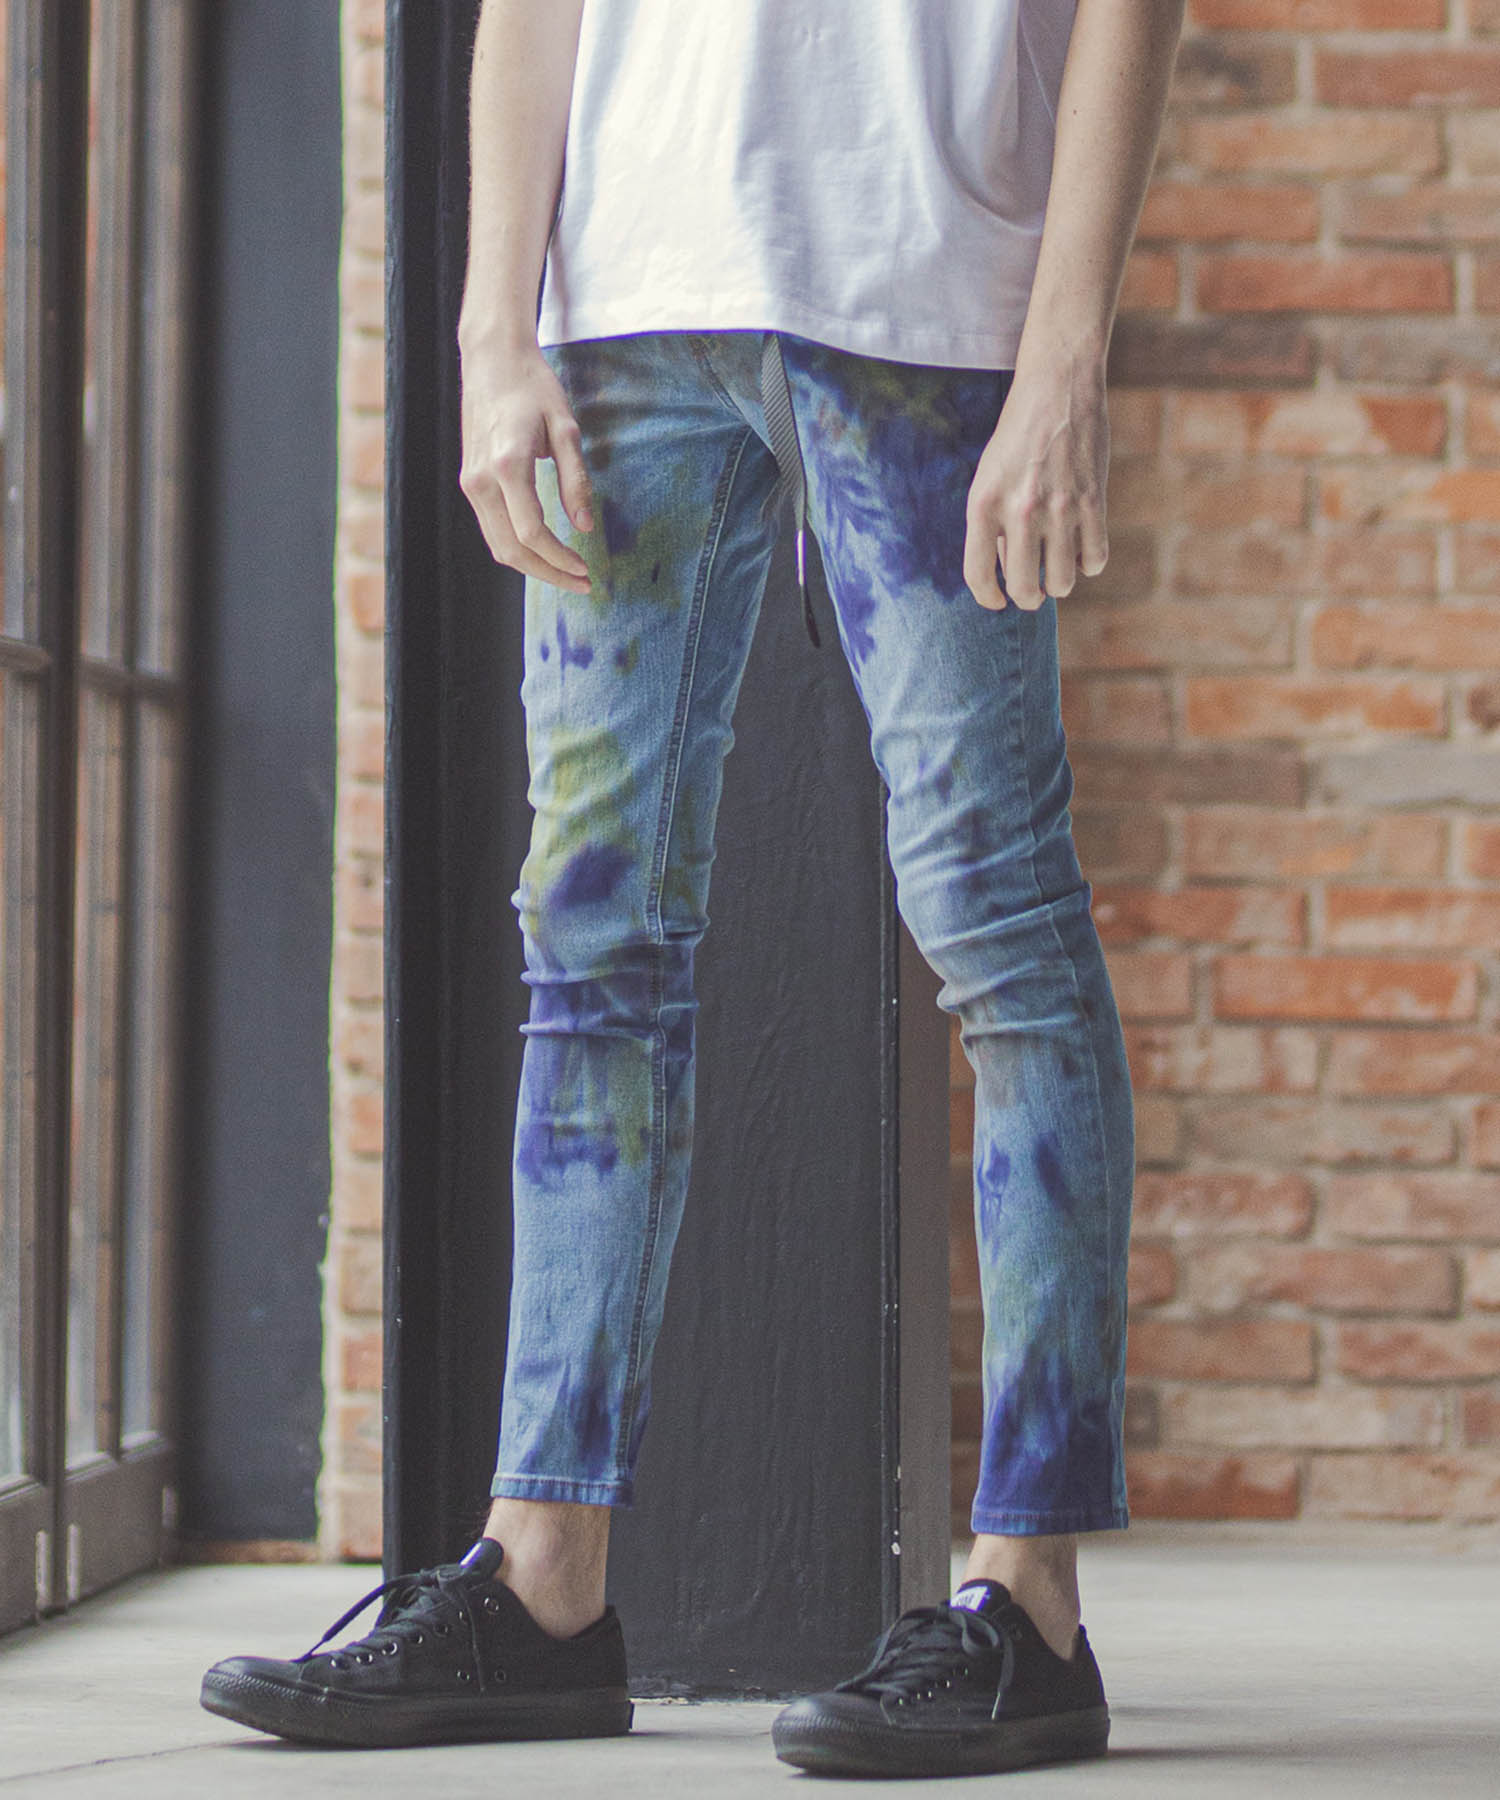 【GLIMCLAP(グリムクラップ)】Marble dye Stretch denim Pants スキニーデニムパンツ(014gls-ca)